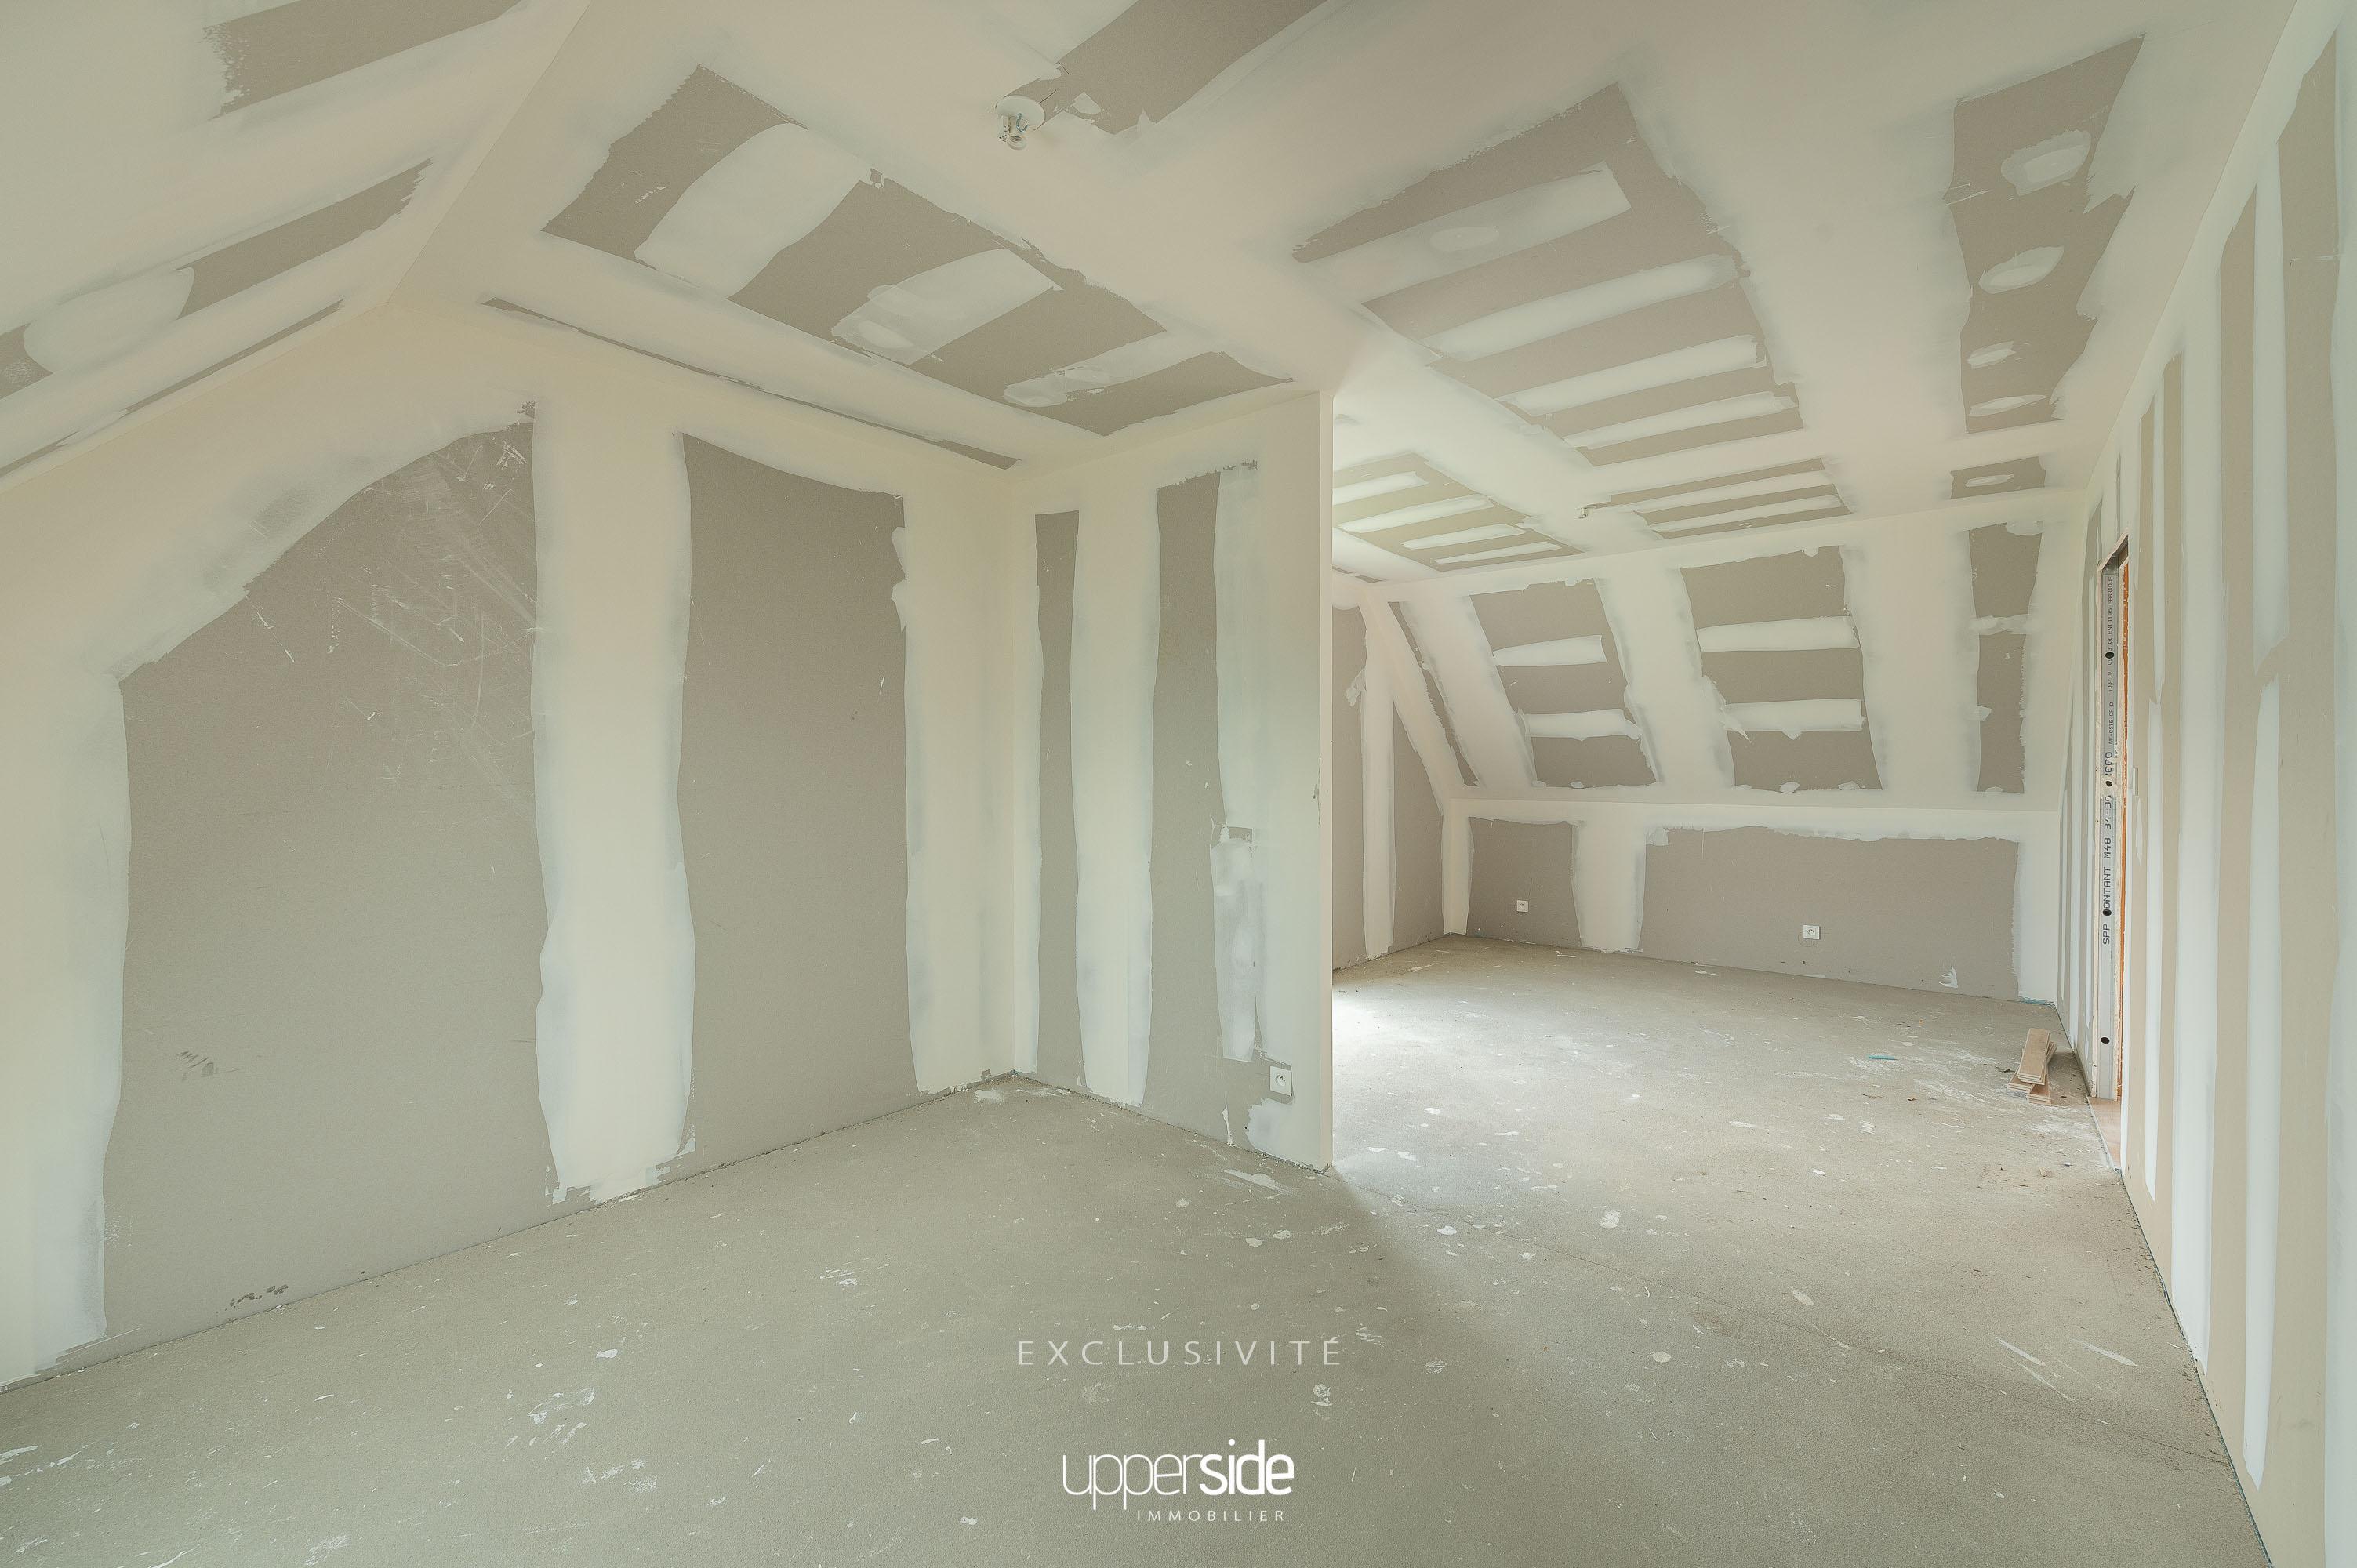 BENRO – Maison neuve prête à décorer au calme Image